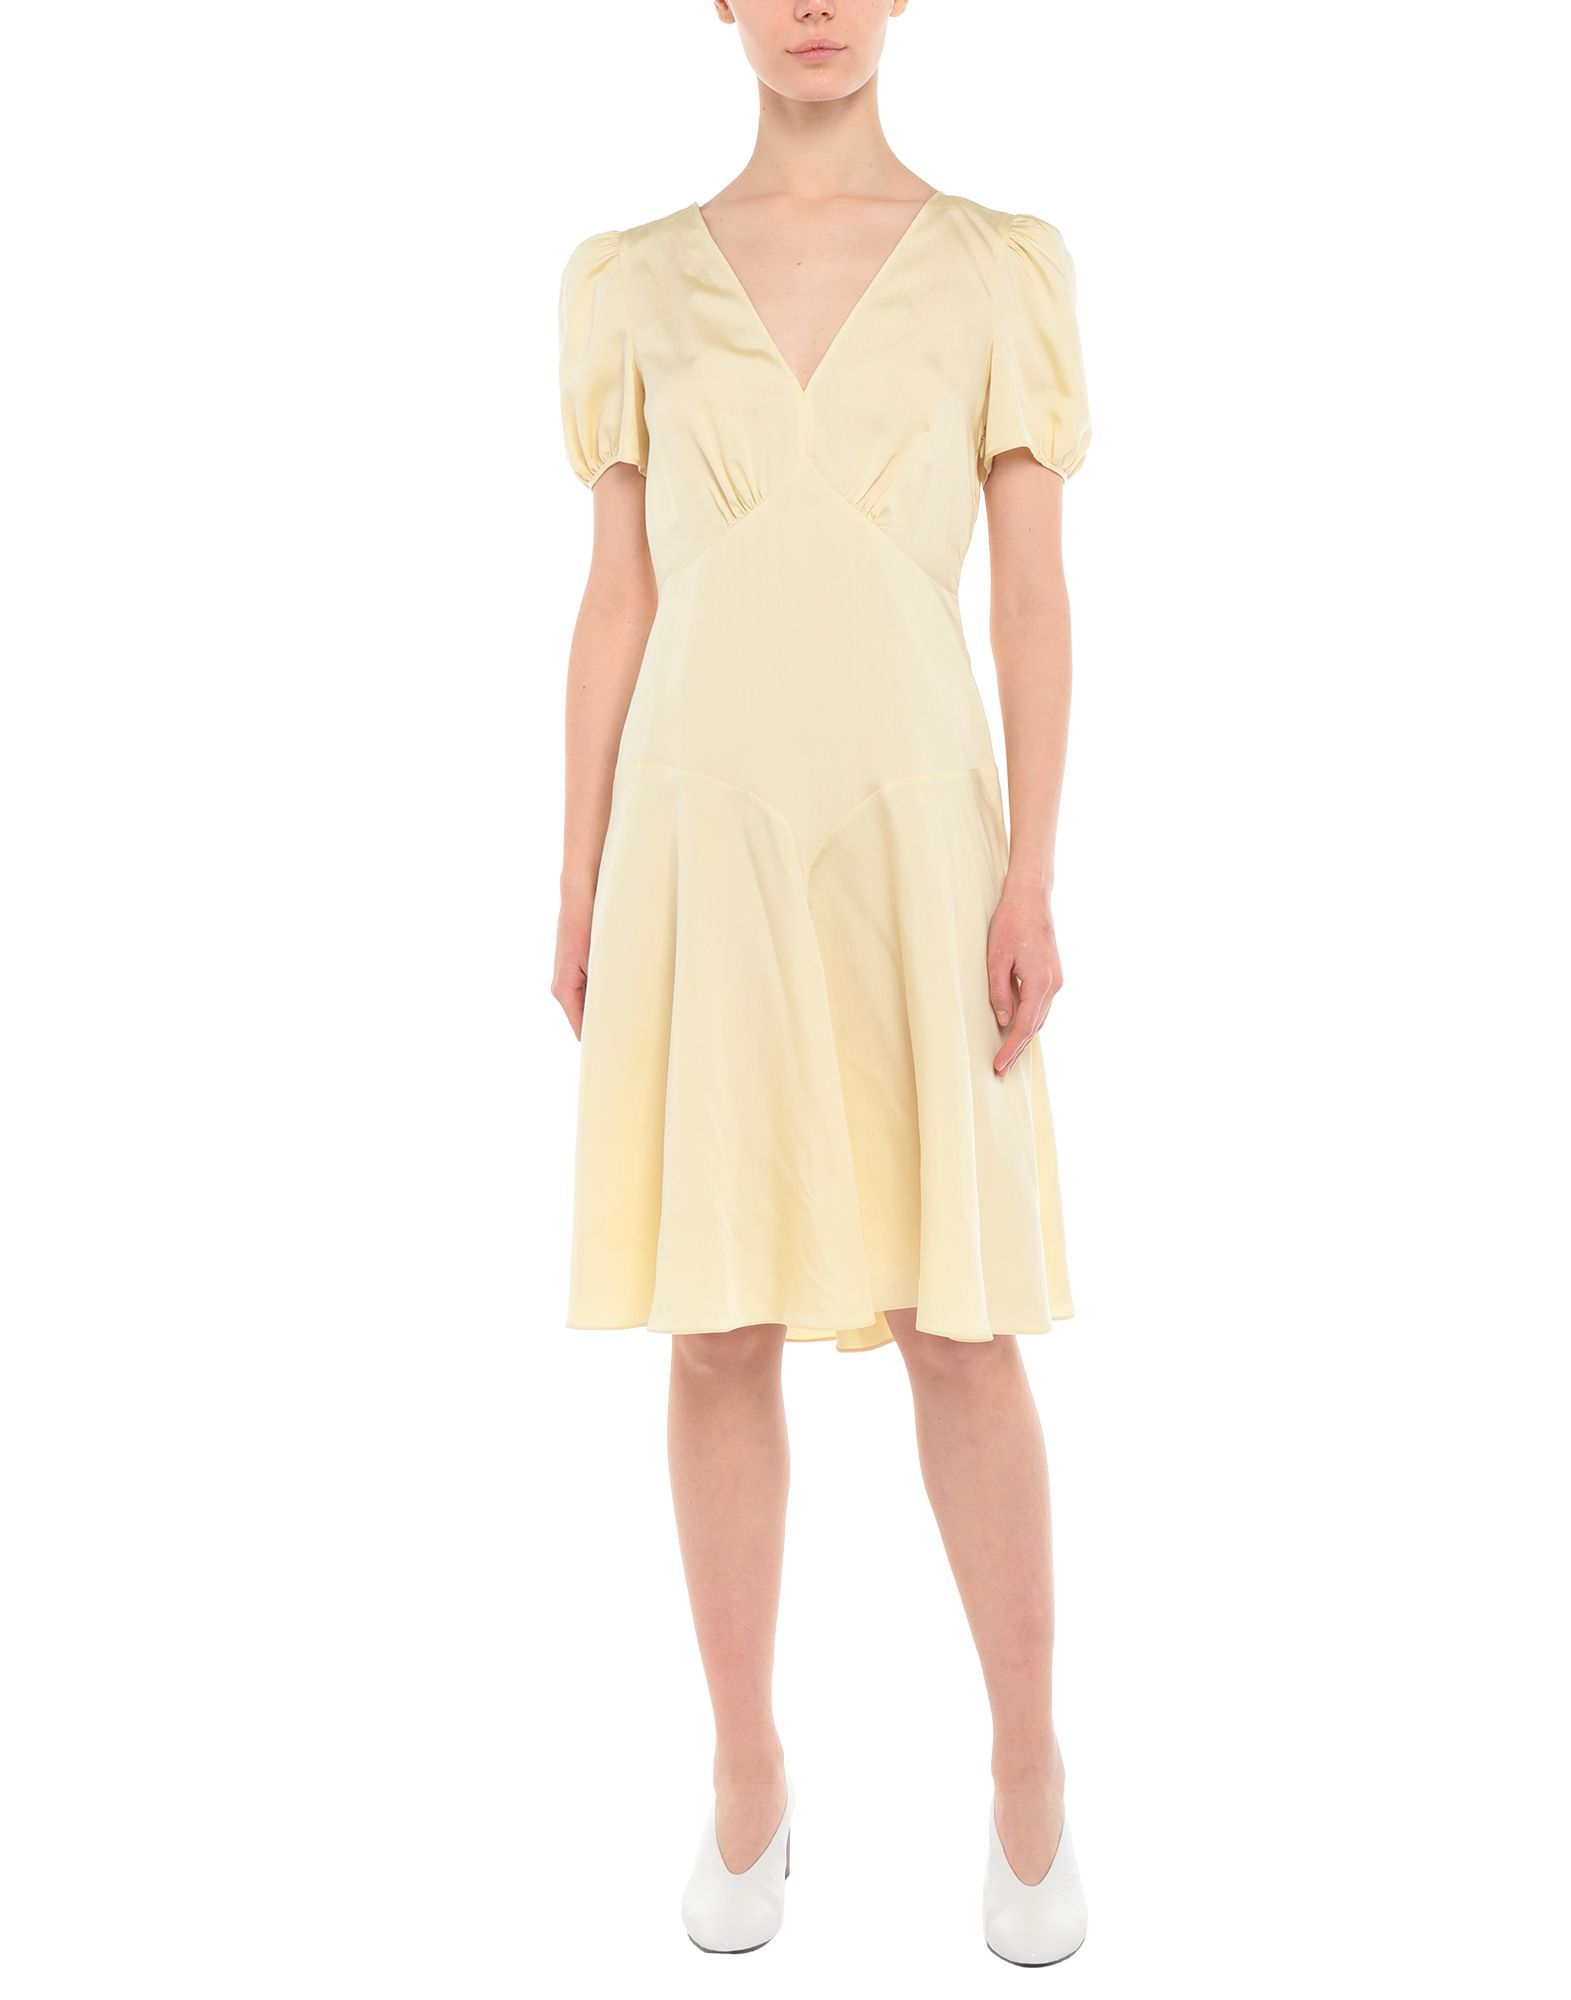 210d1a8854e6 Moschino Short Dress - Women Moschino Short Dresses online on YOOX United  States - 34935240FI